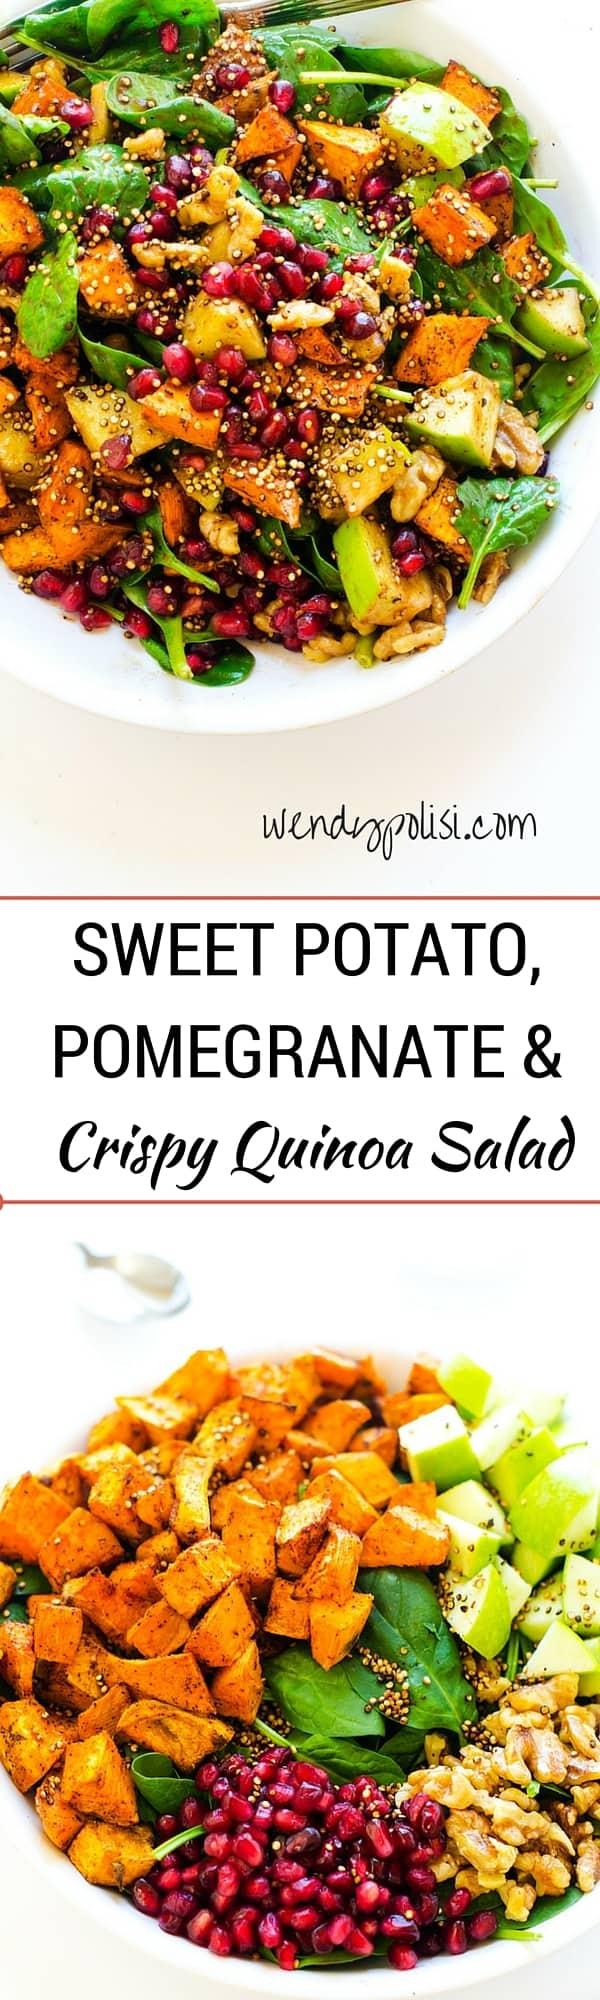 Sweet Potato, Pomegranate & Crispy Quinoa Salad-1